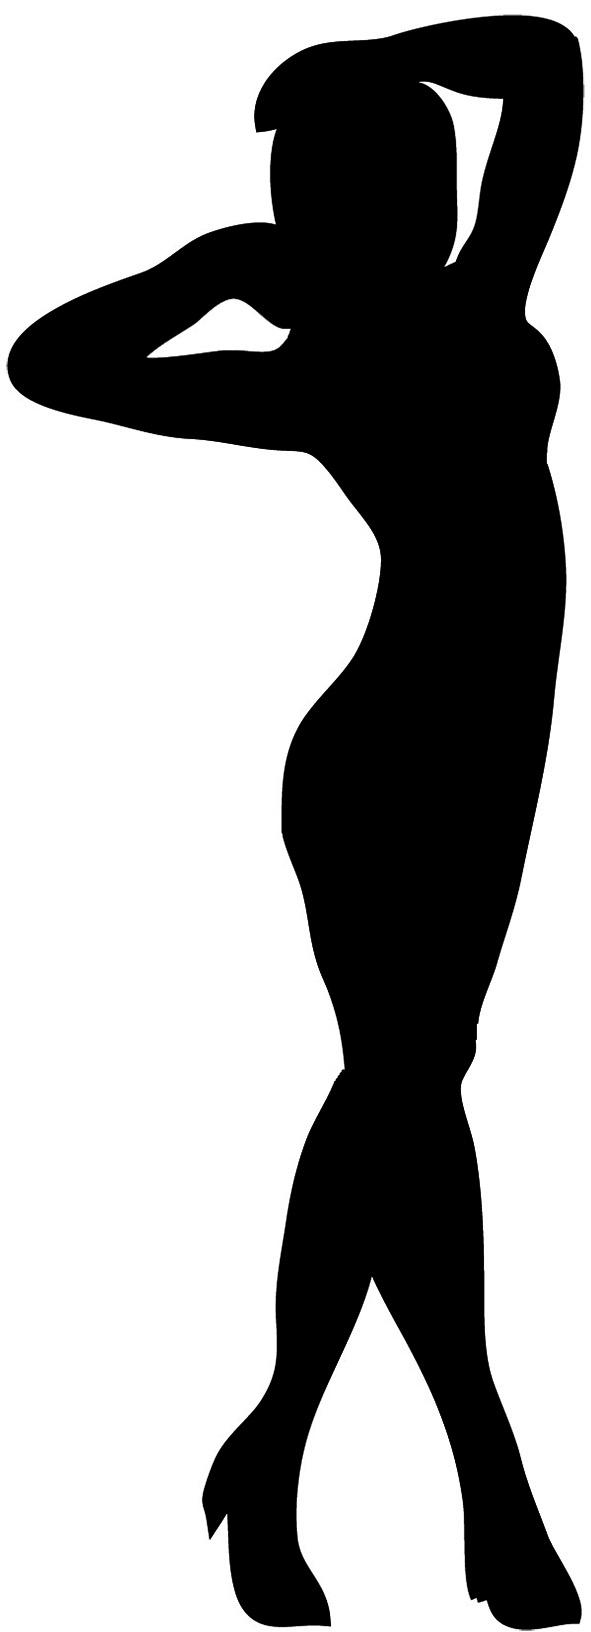 Girl Silhouette at GetDrawings | Free download